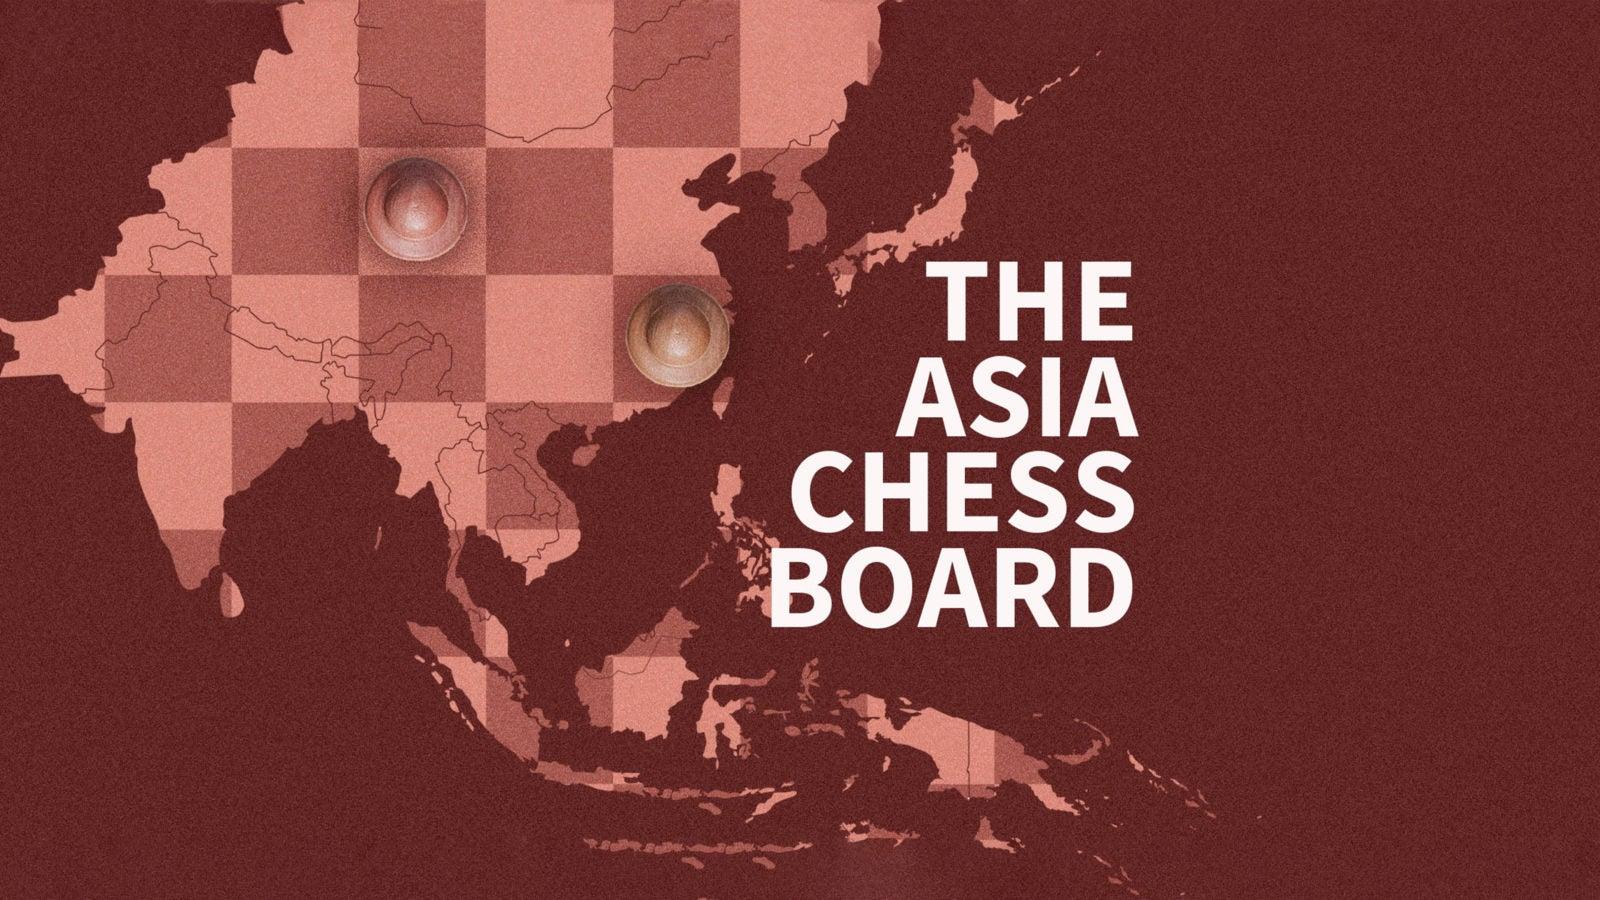 The Asia Chessboard logo